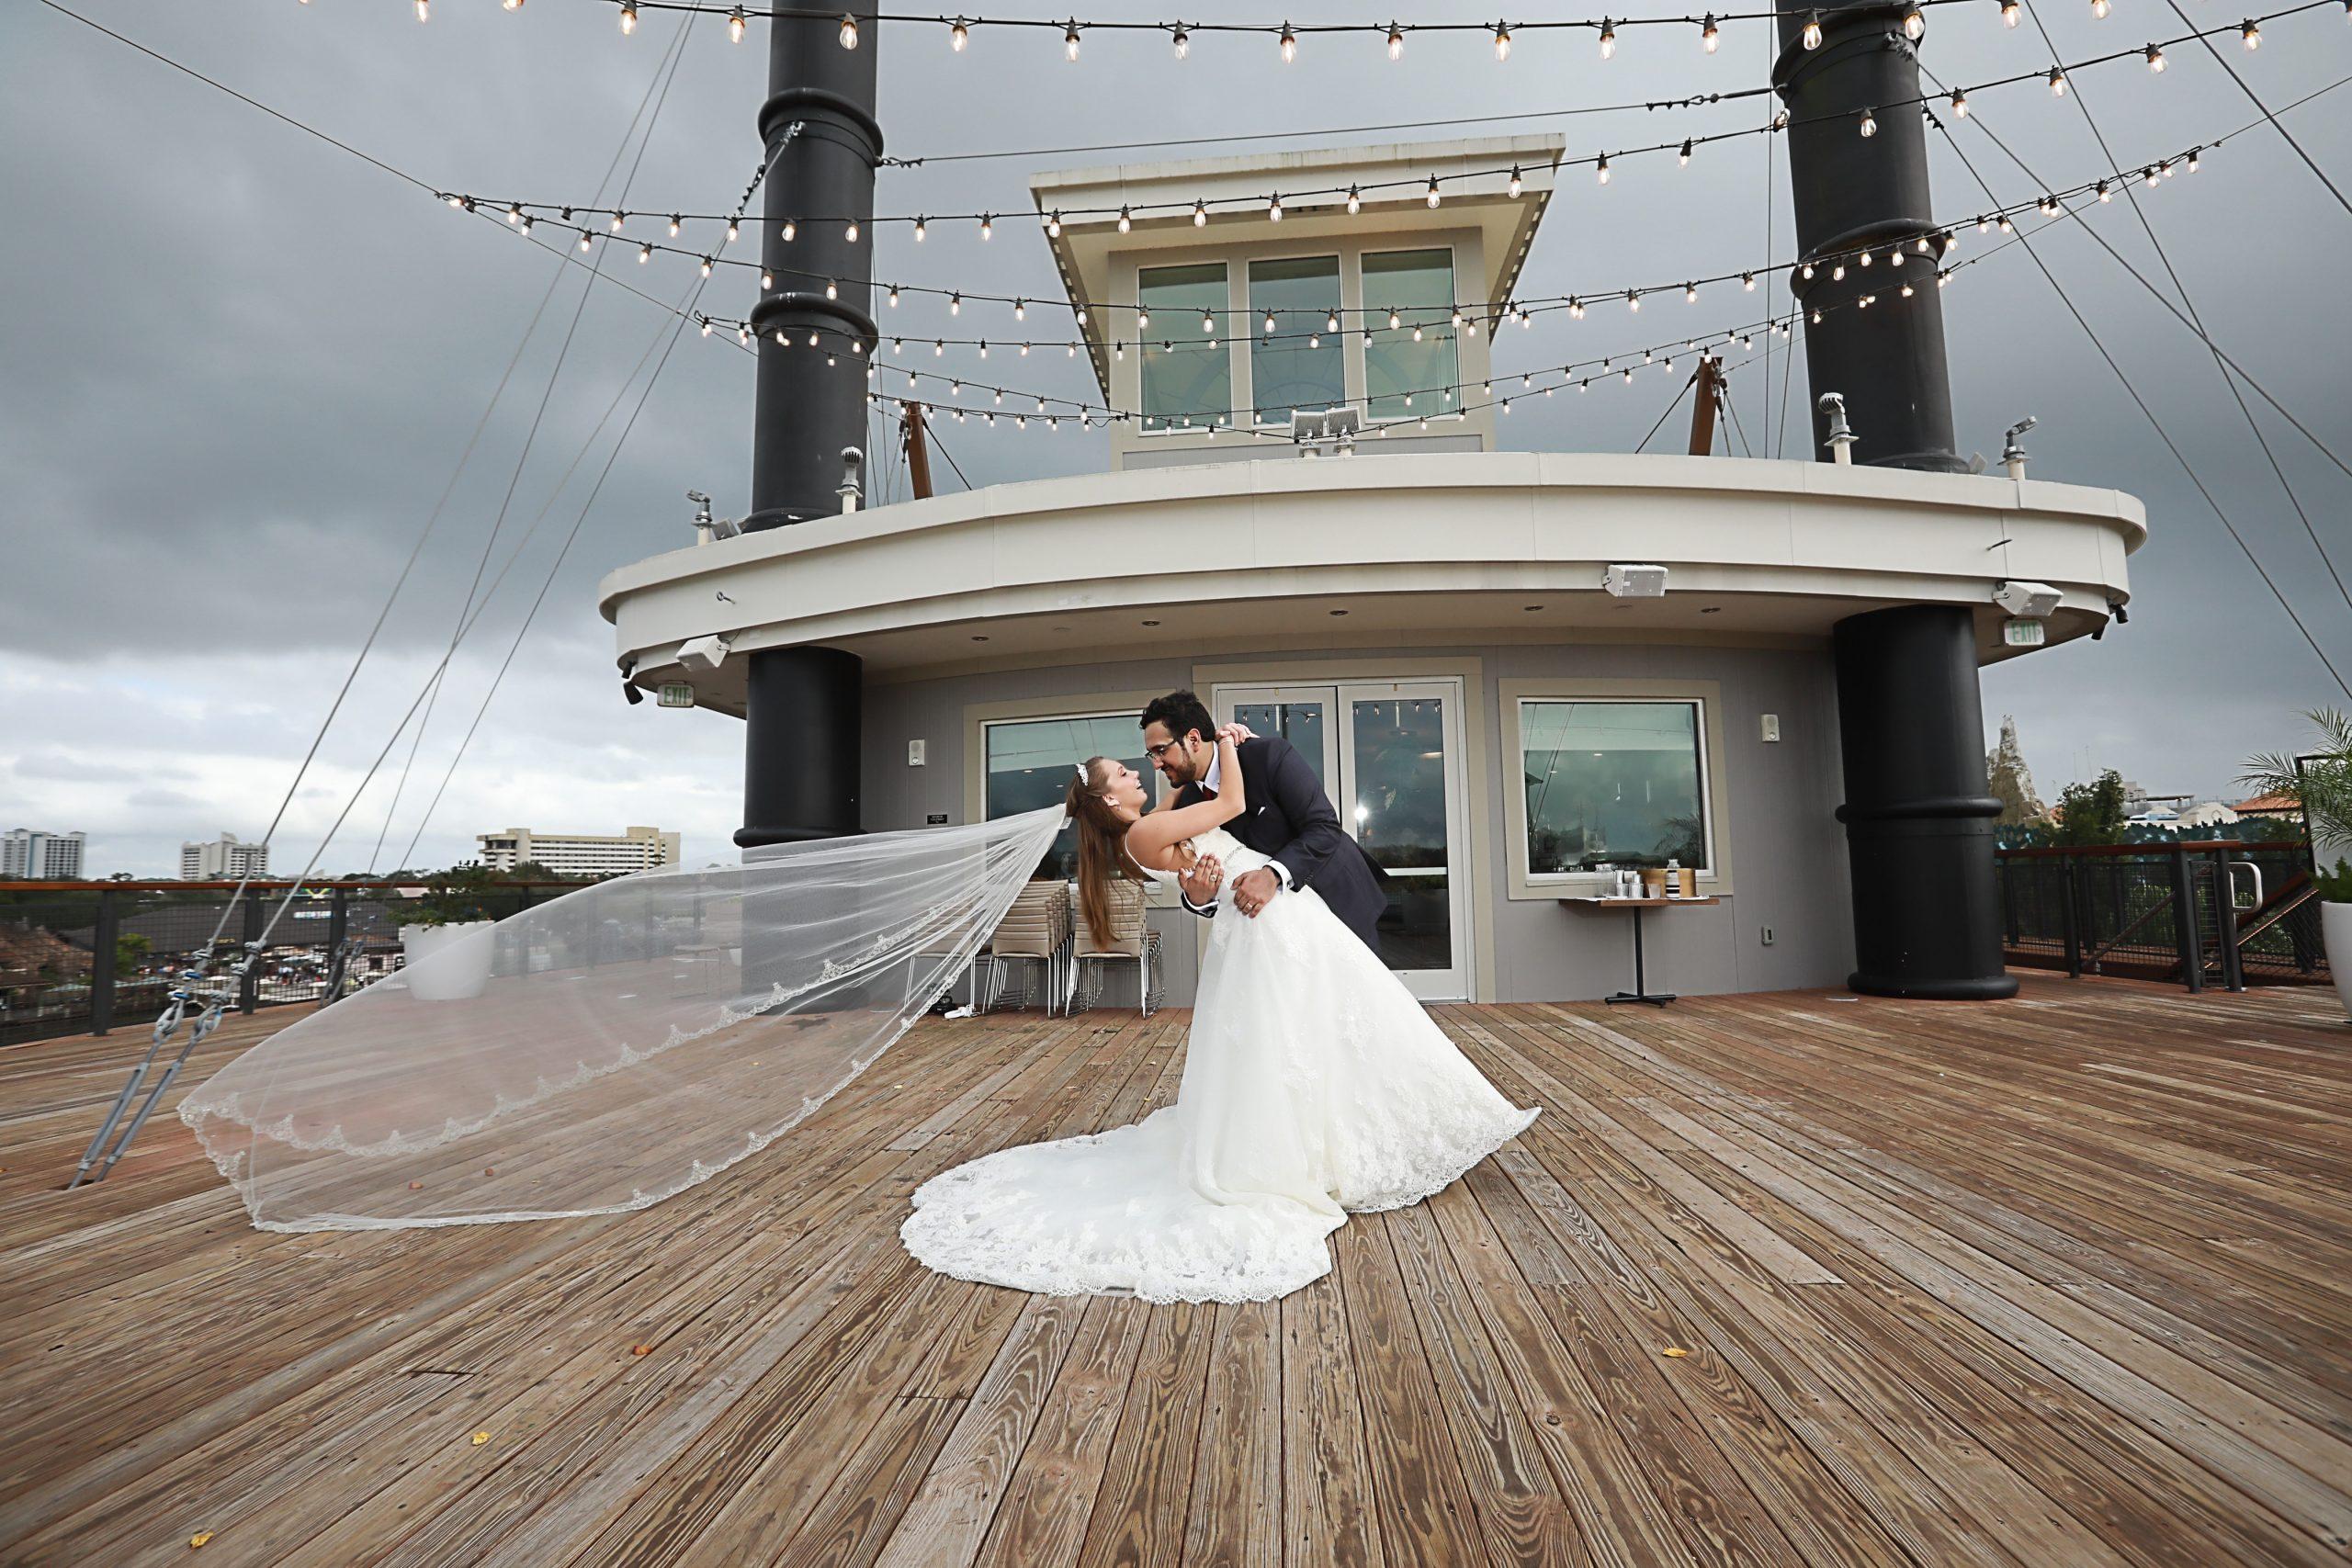 Mary Poppins Theme | The Paddlefish Wedding of Sydney and Frederico